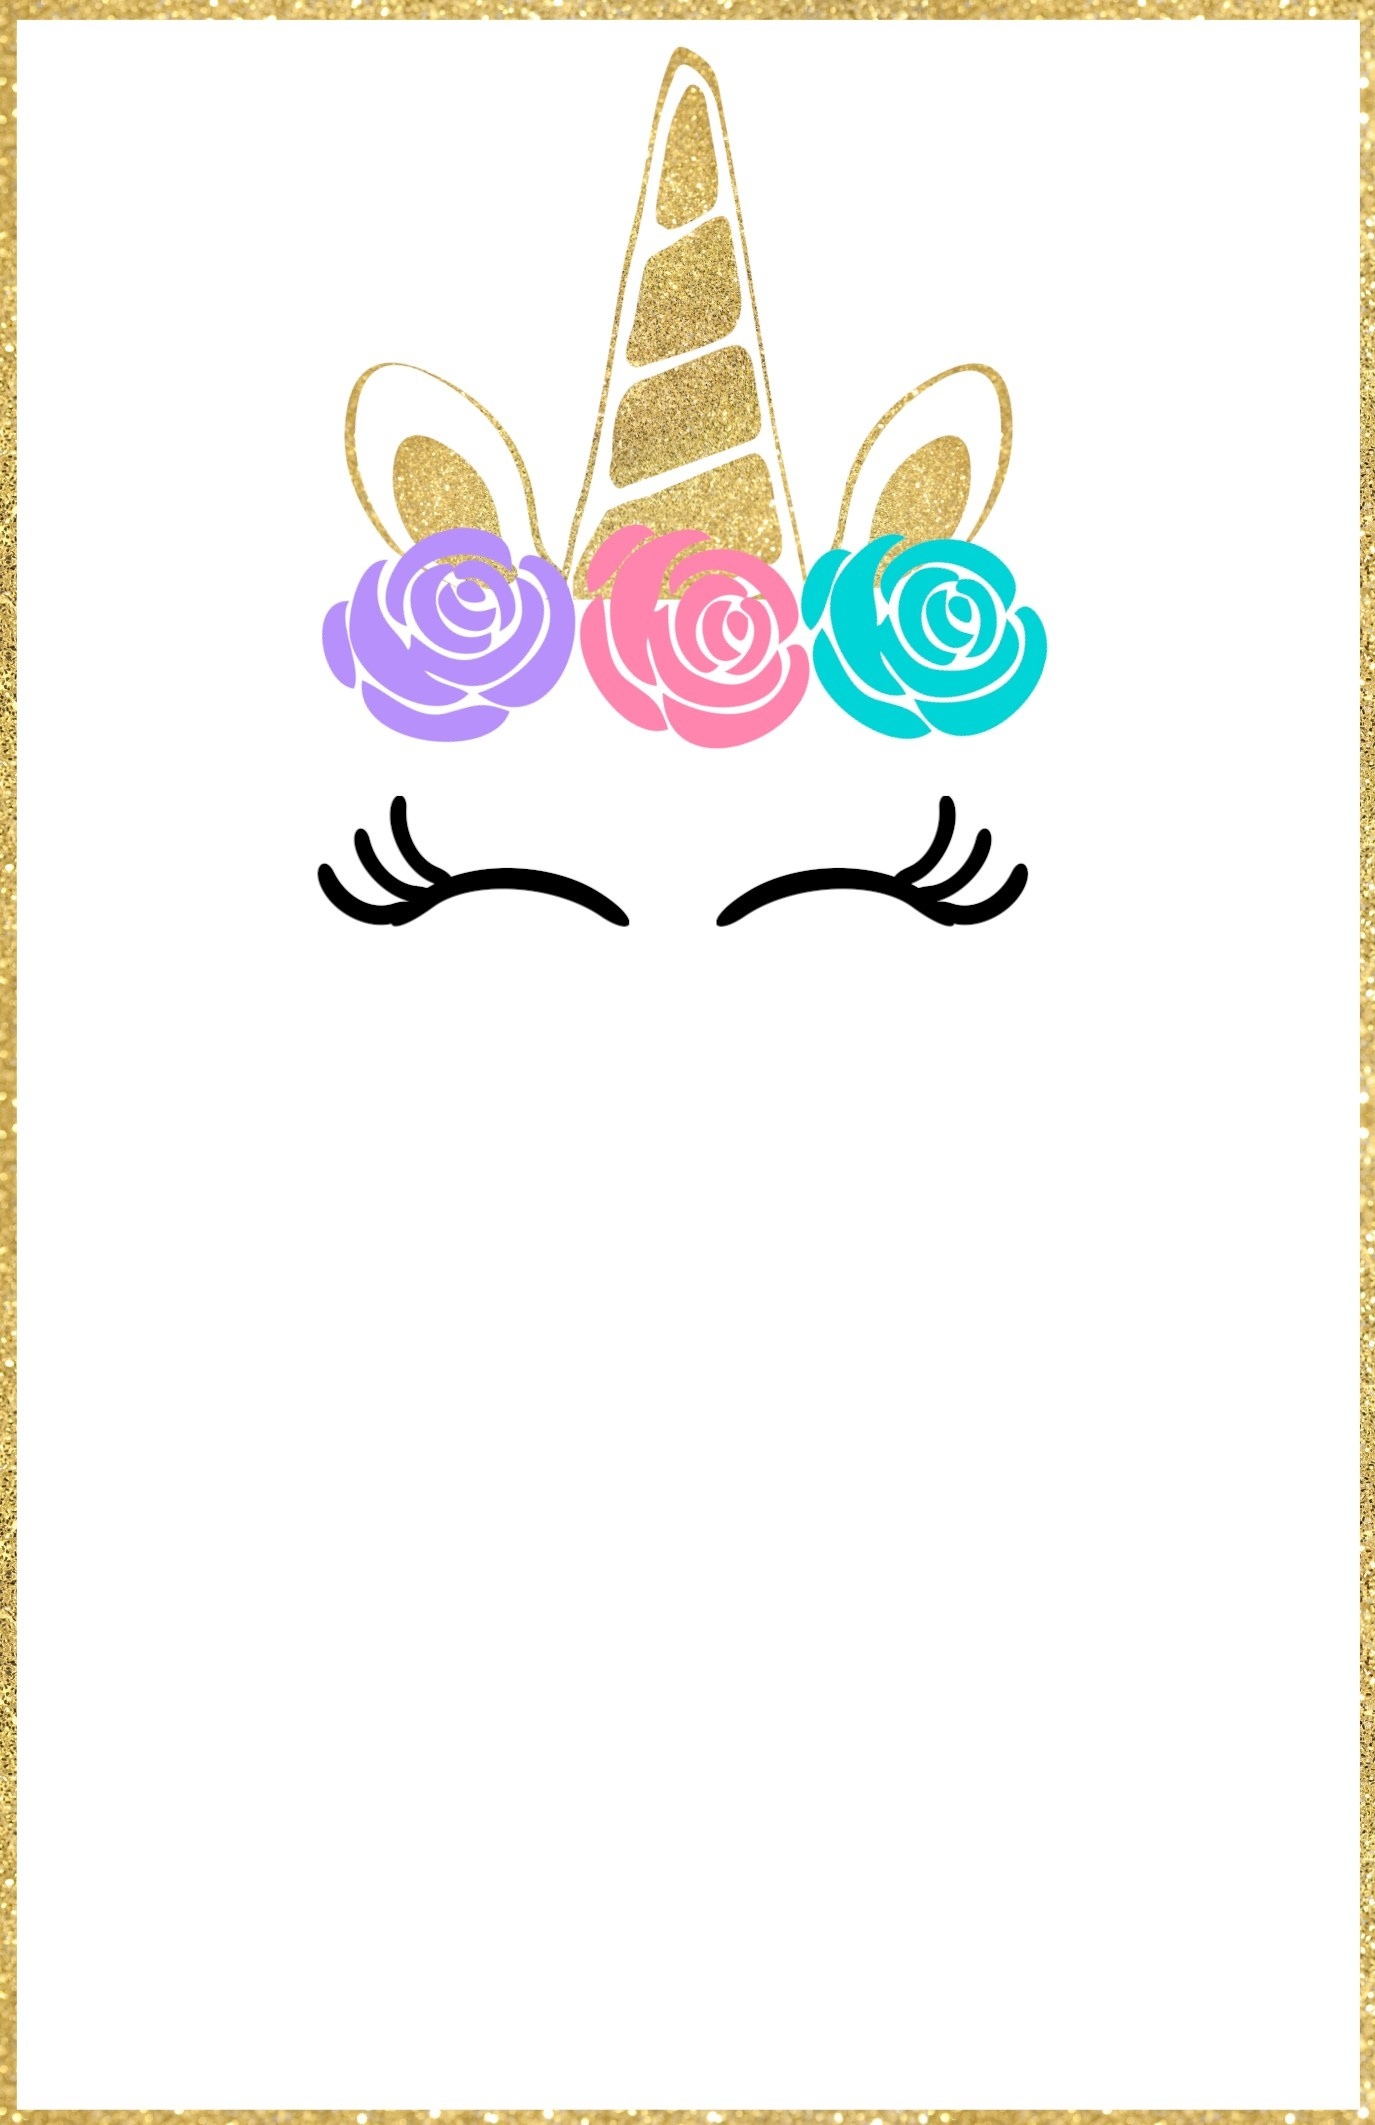 Free Printable Unicorn Invitations Template - Paper Trail Design - Free Printable Invitations